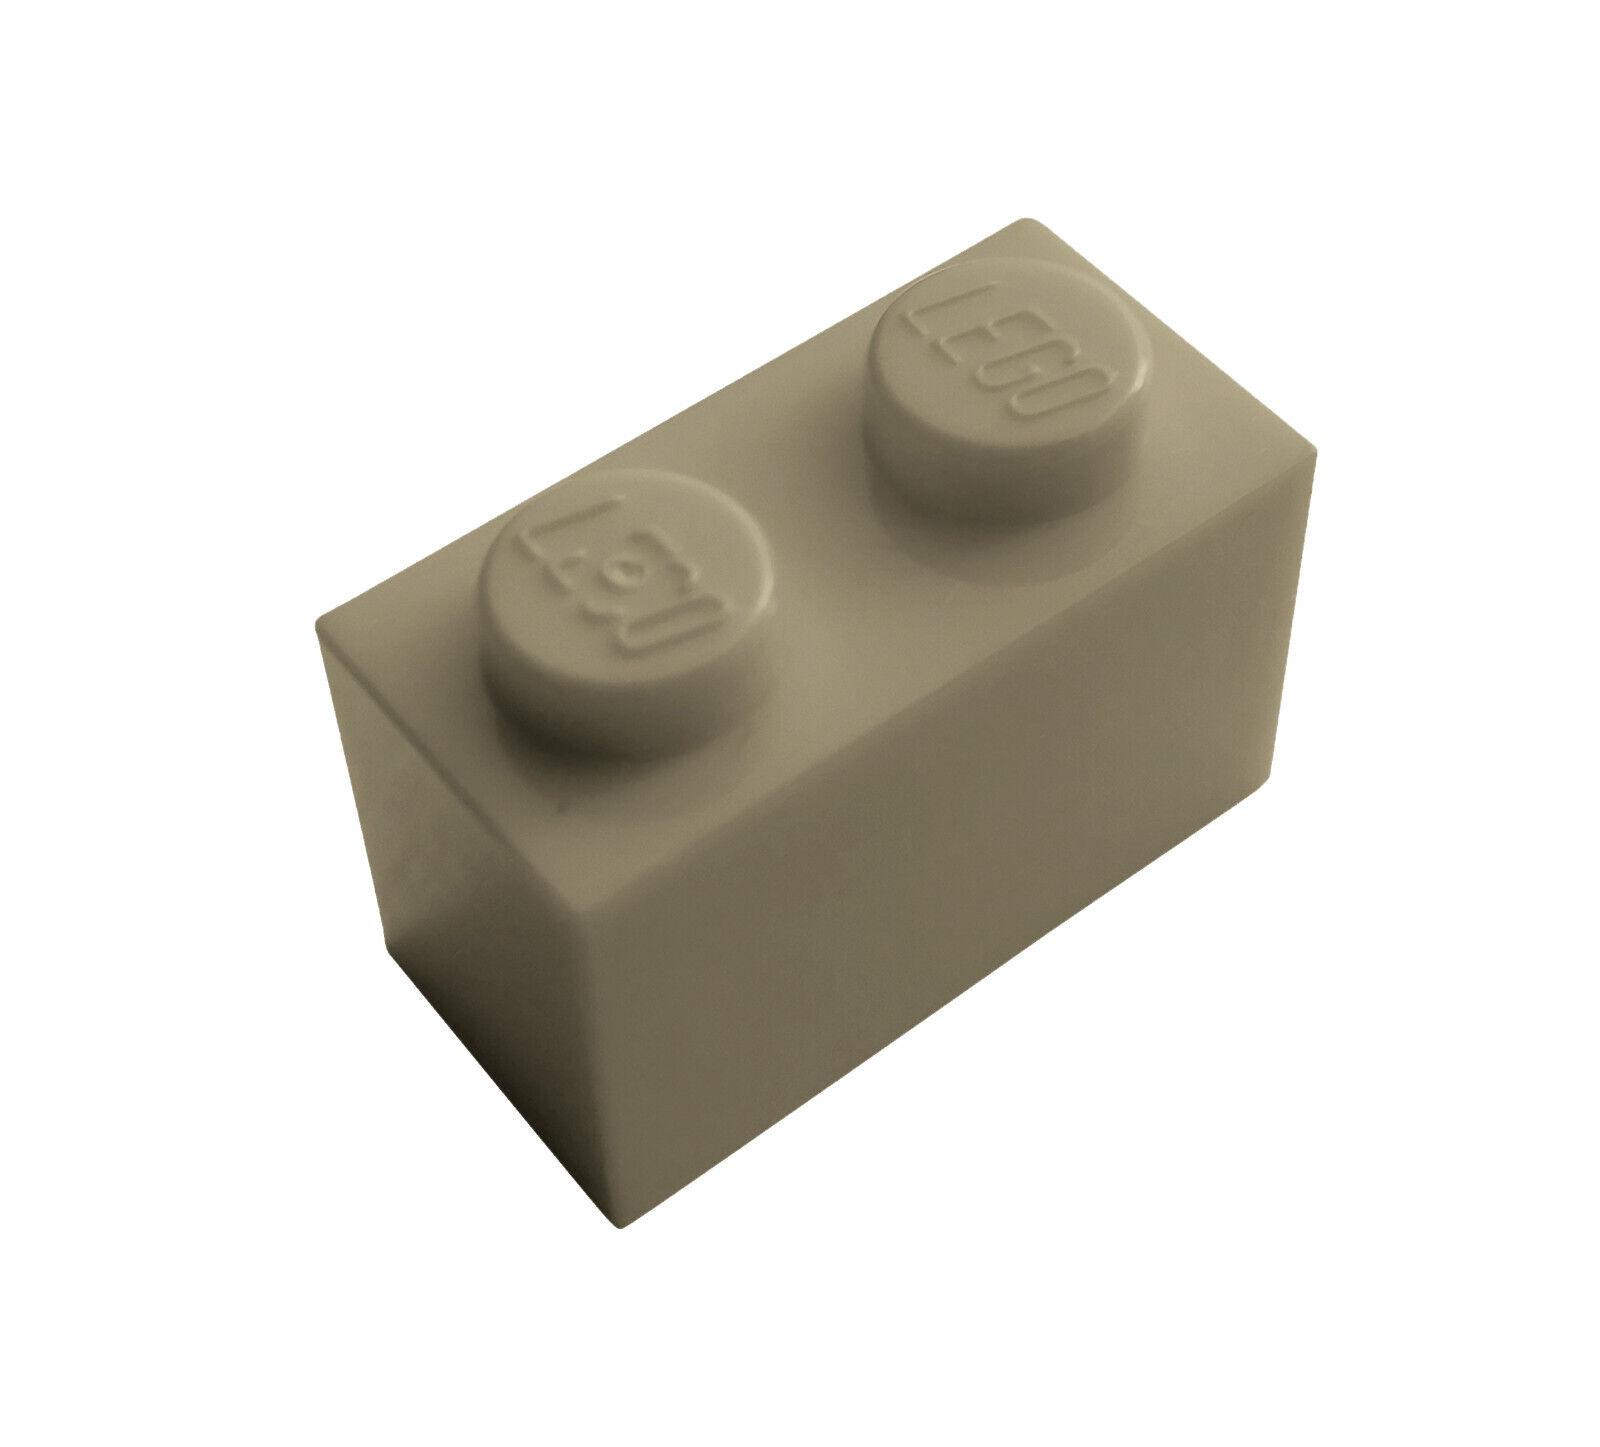 tan 50 Stück Lego Stein beige Neu** 3004,1x2